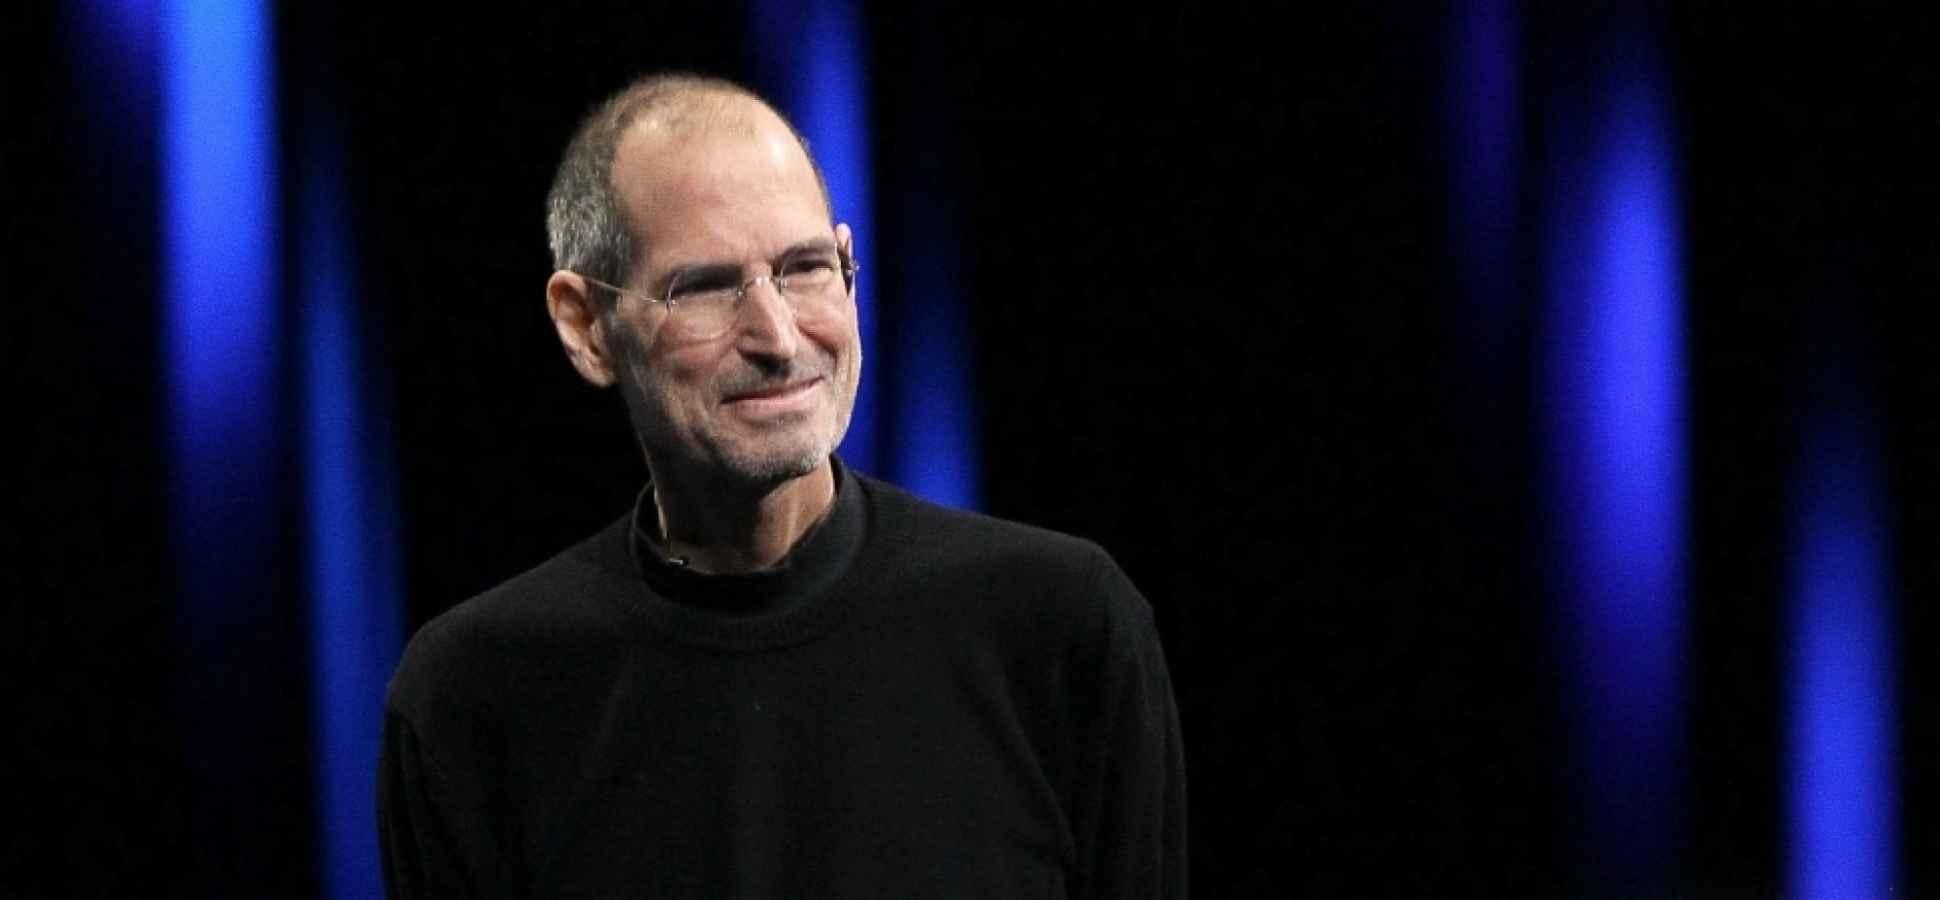 Steve Jobs: 19 Inspiring Power Quotes for Success